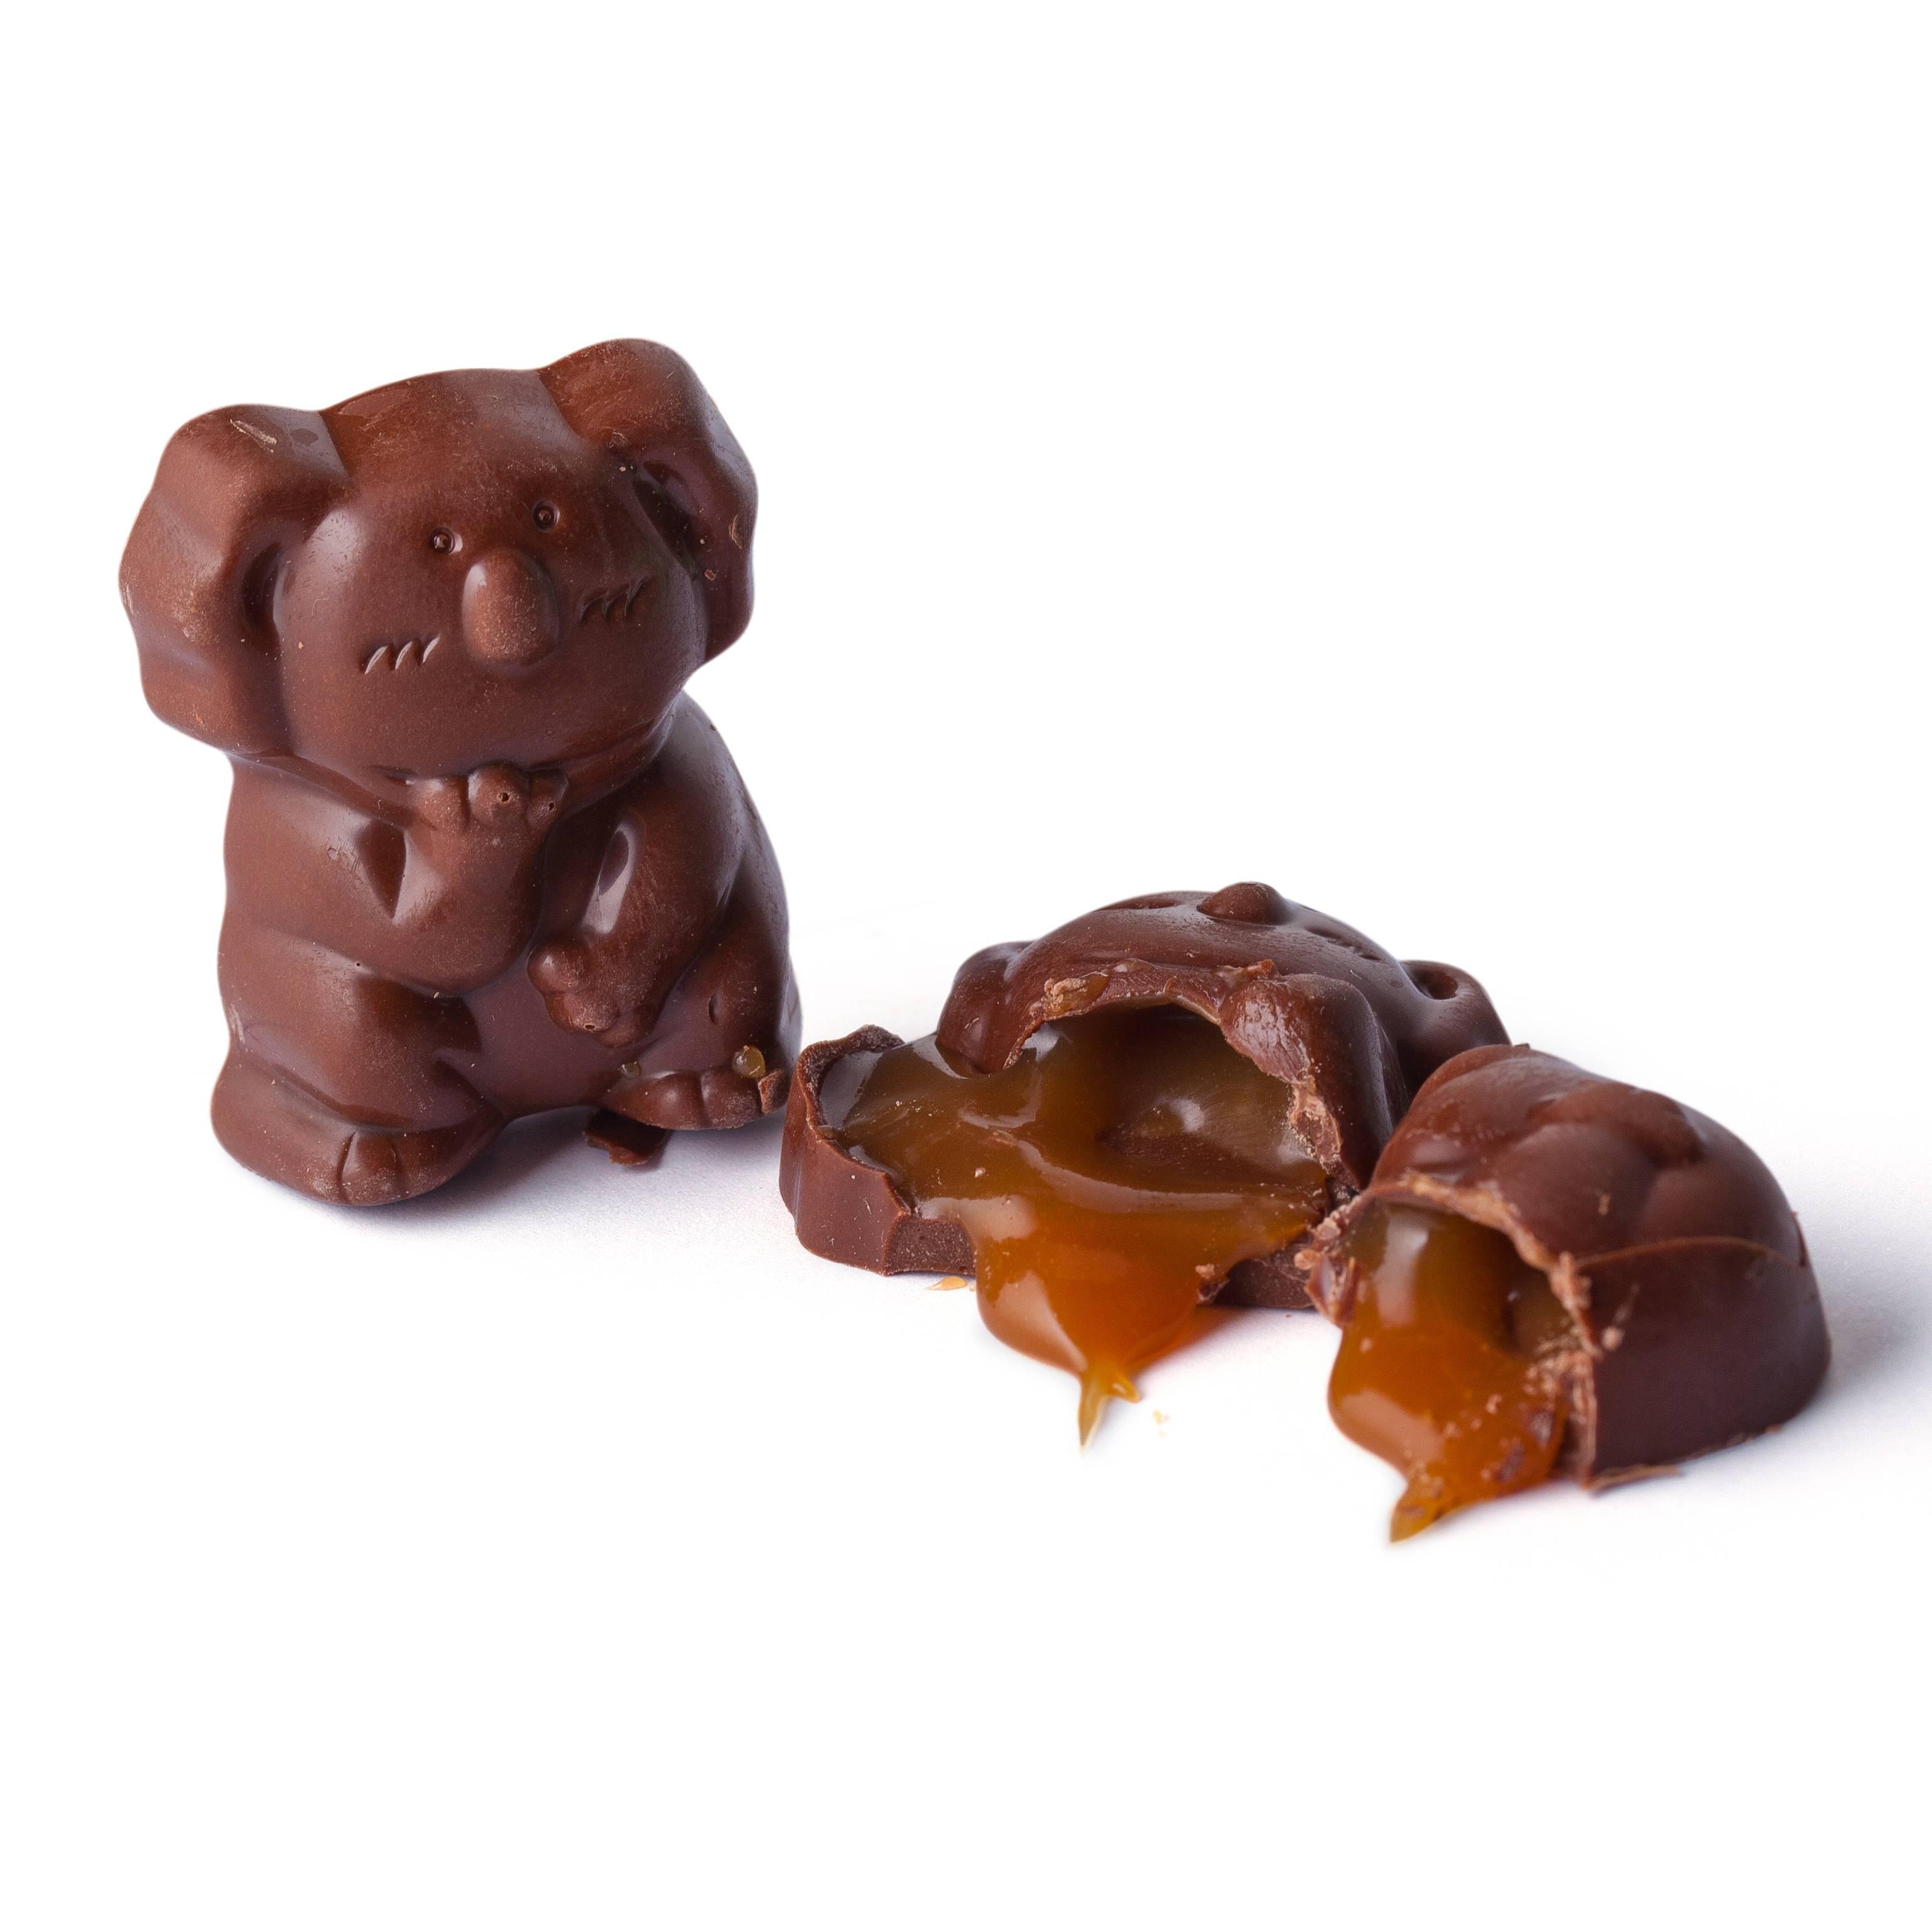 caramel-koala